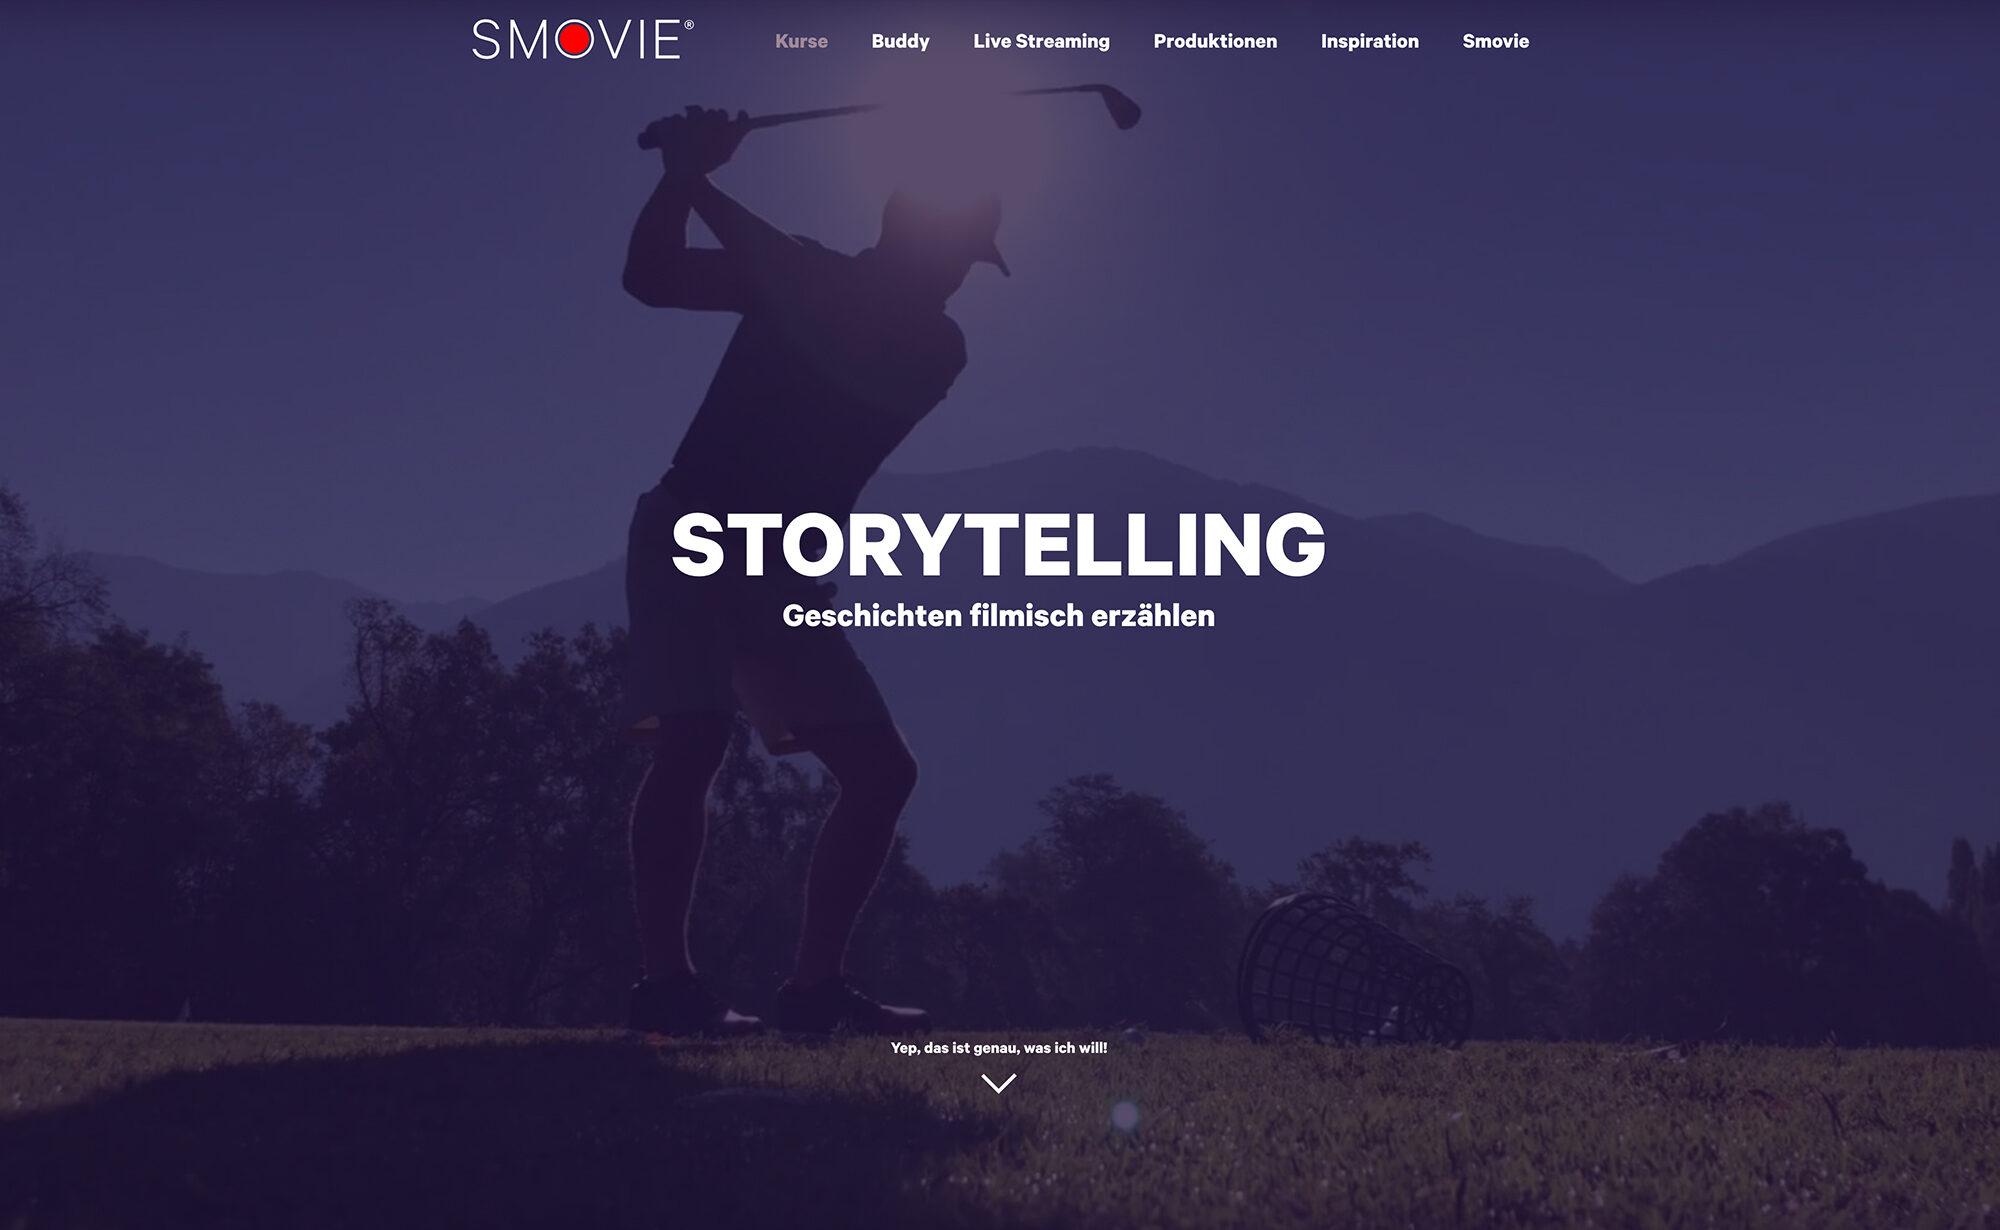 Storytelling, Screenshot Website - Smovie Film GmbH, smovie.ch